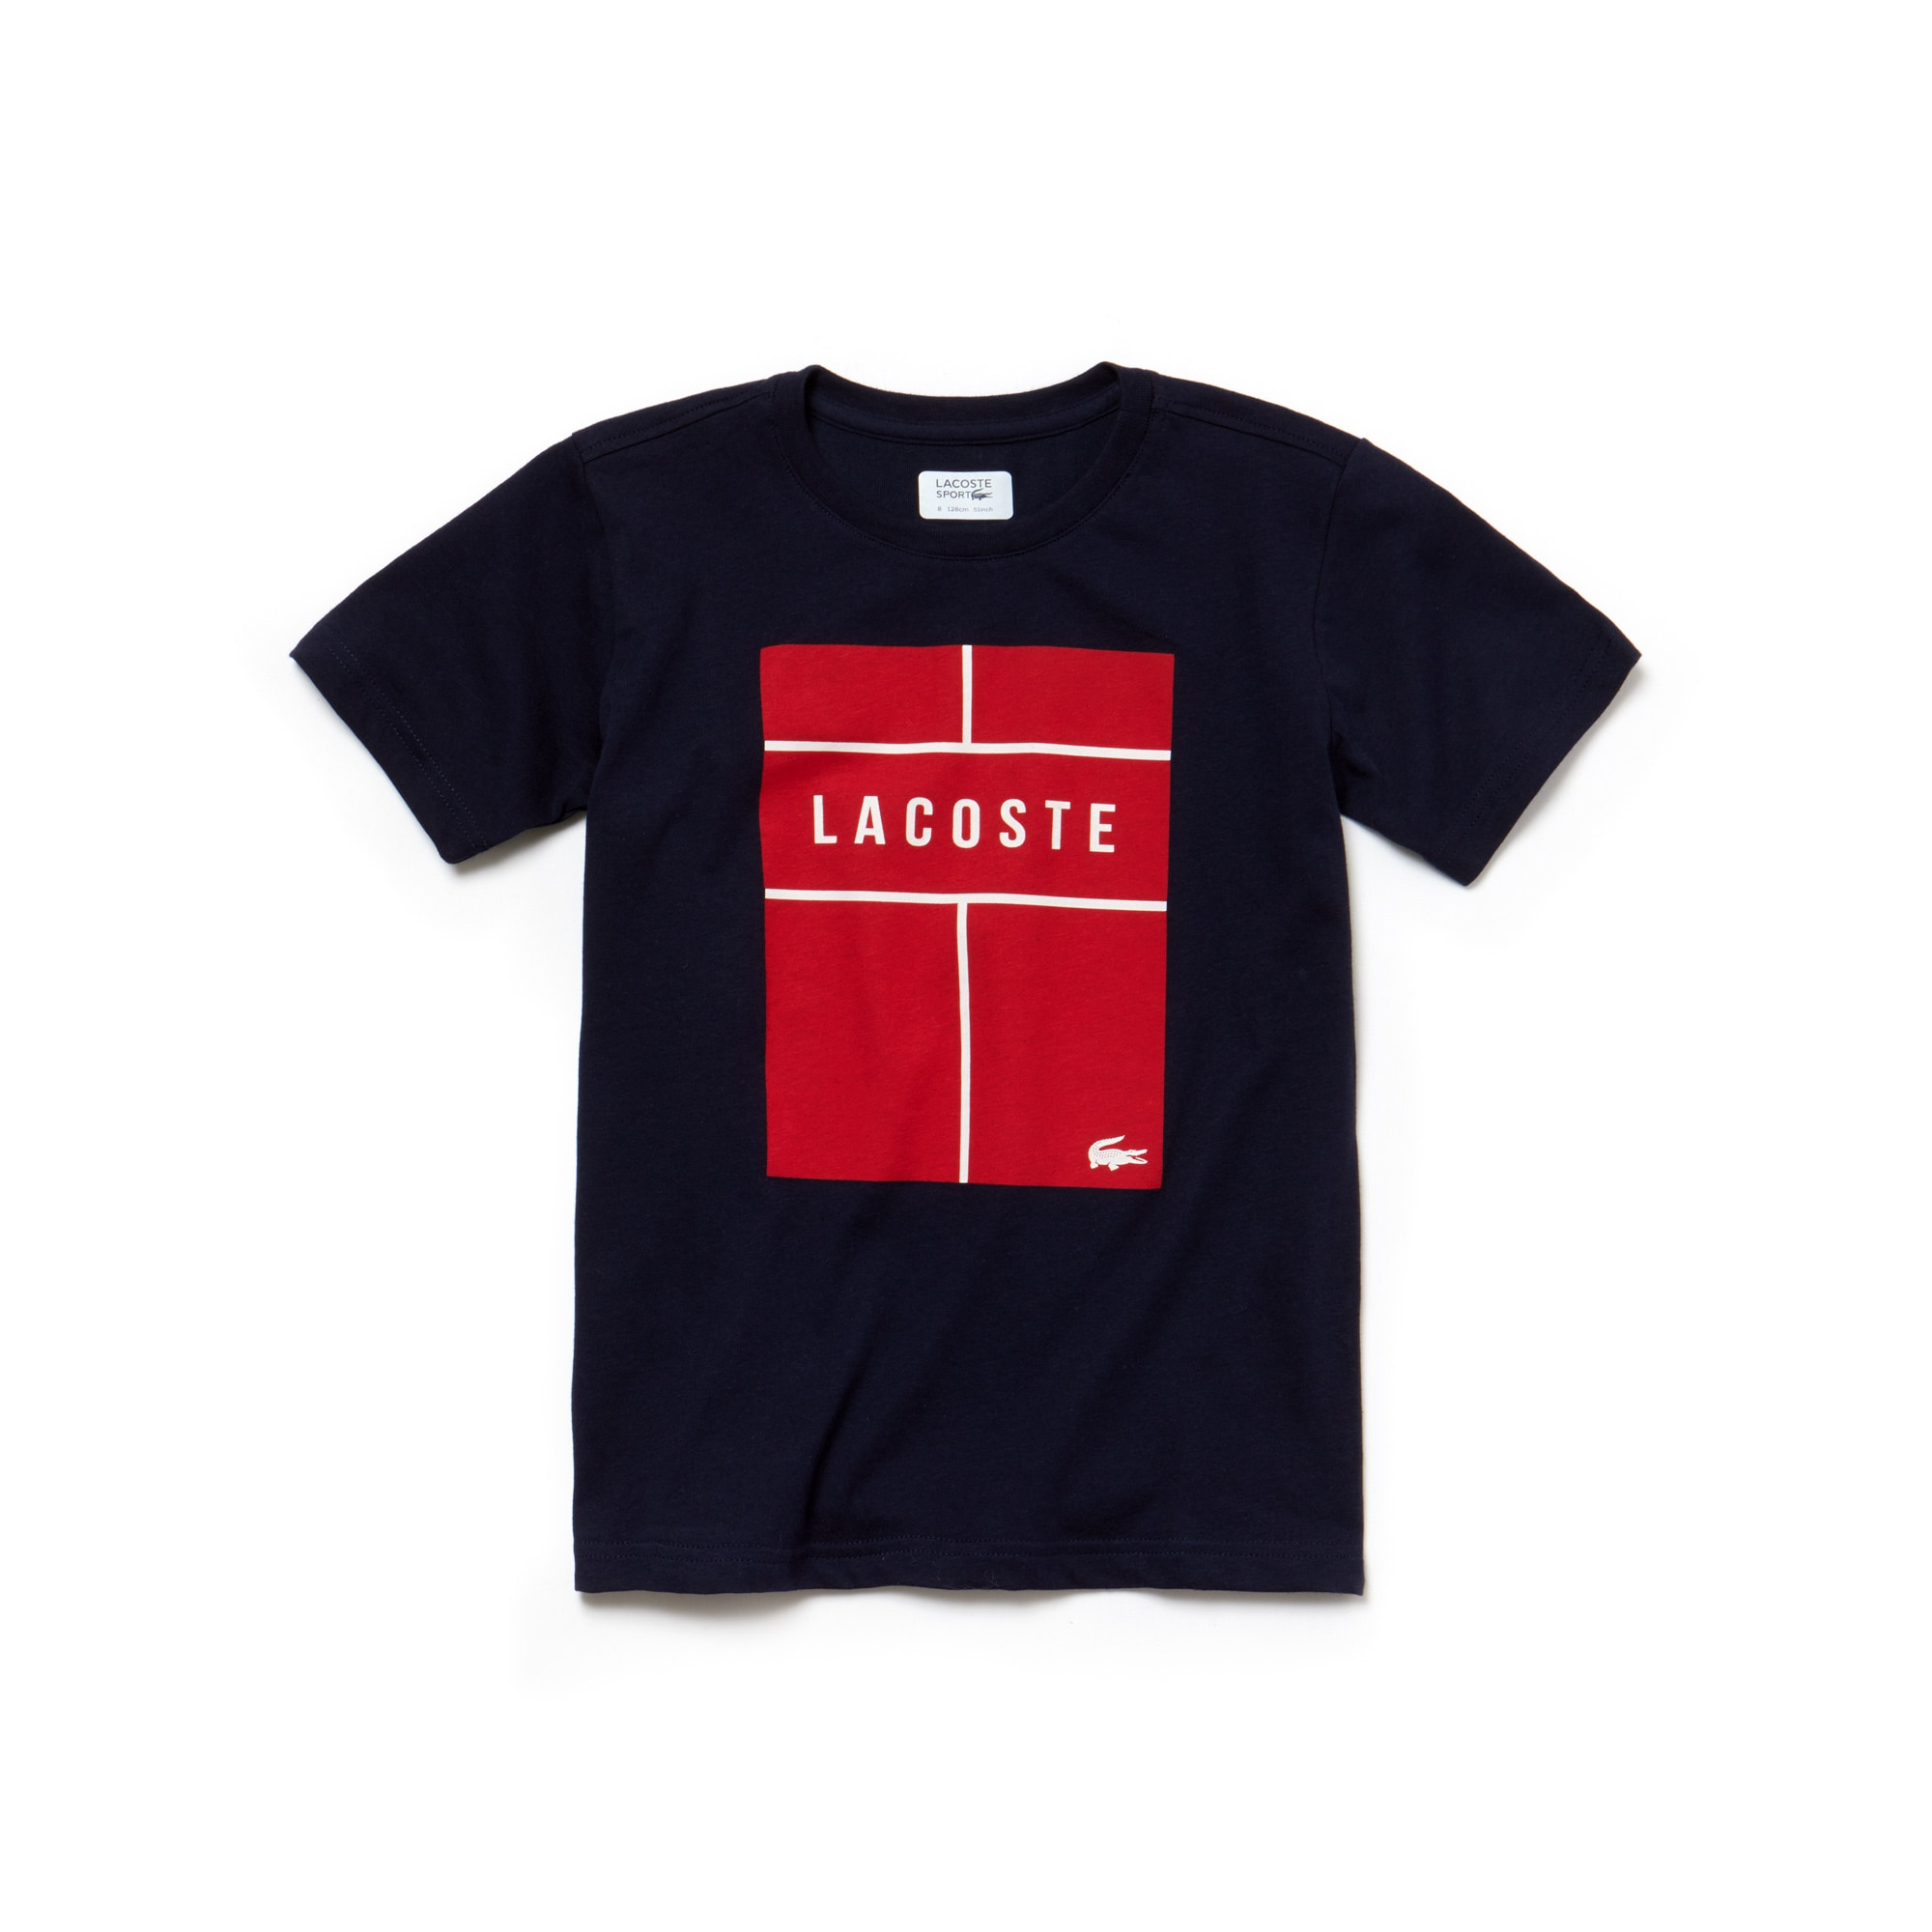 T-shirt da bambino Tennis Lacoste SPORT in jersey tecnico con logo